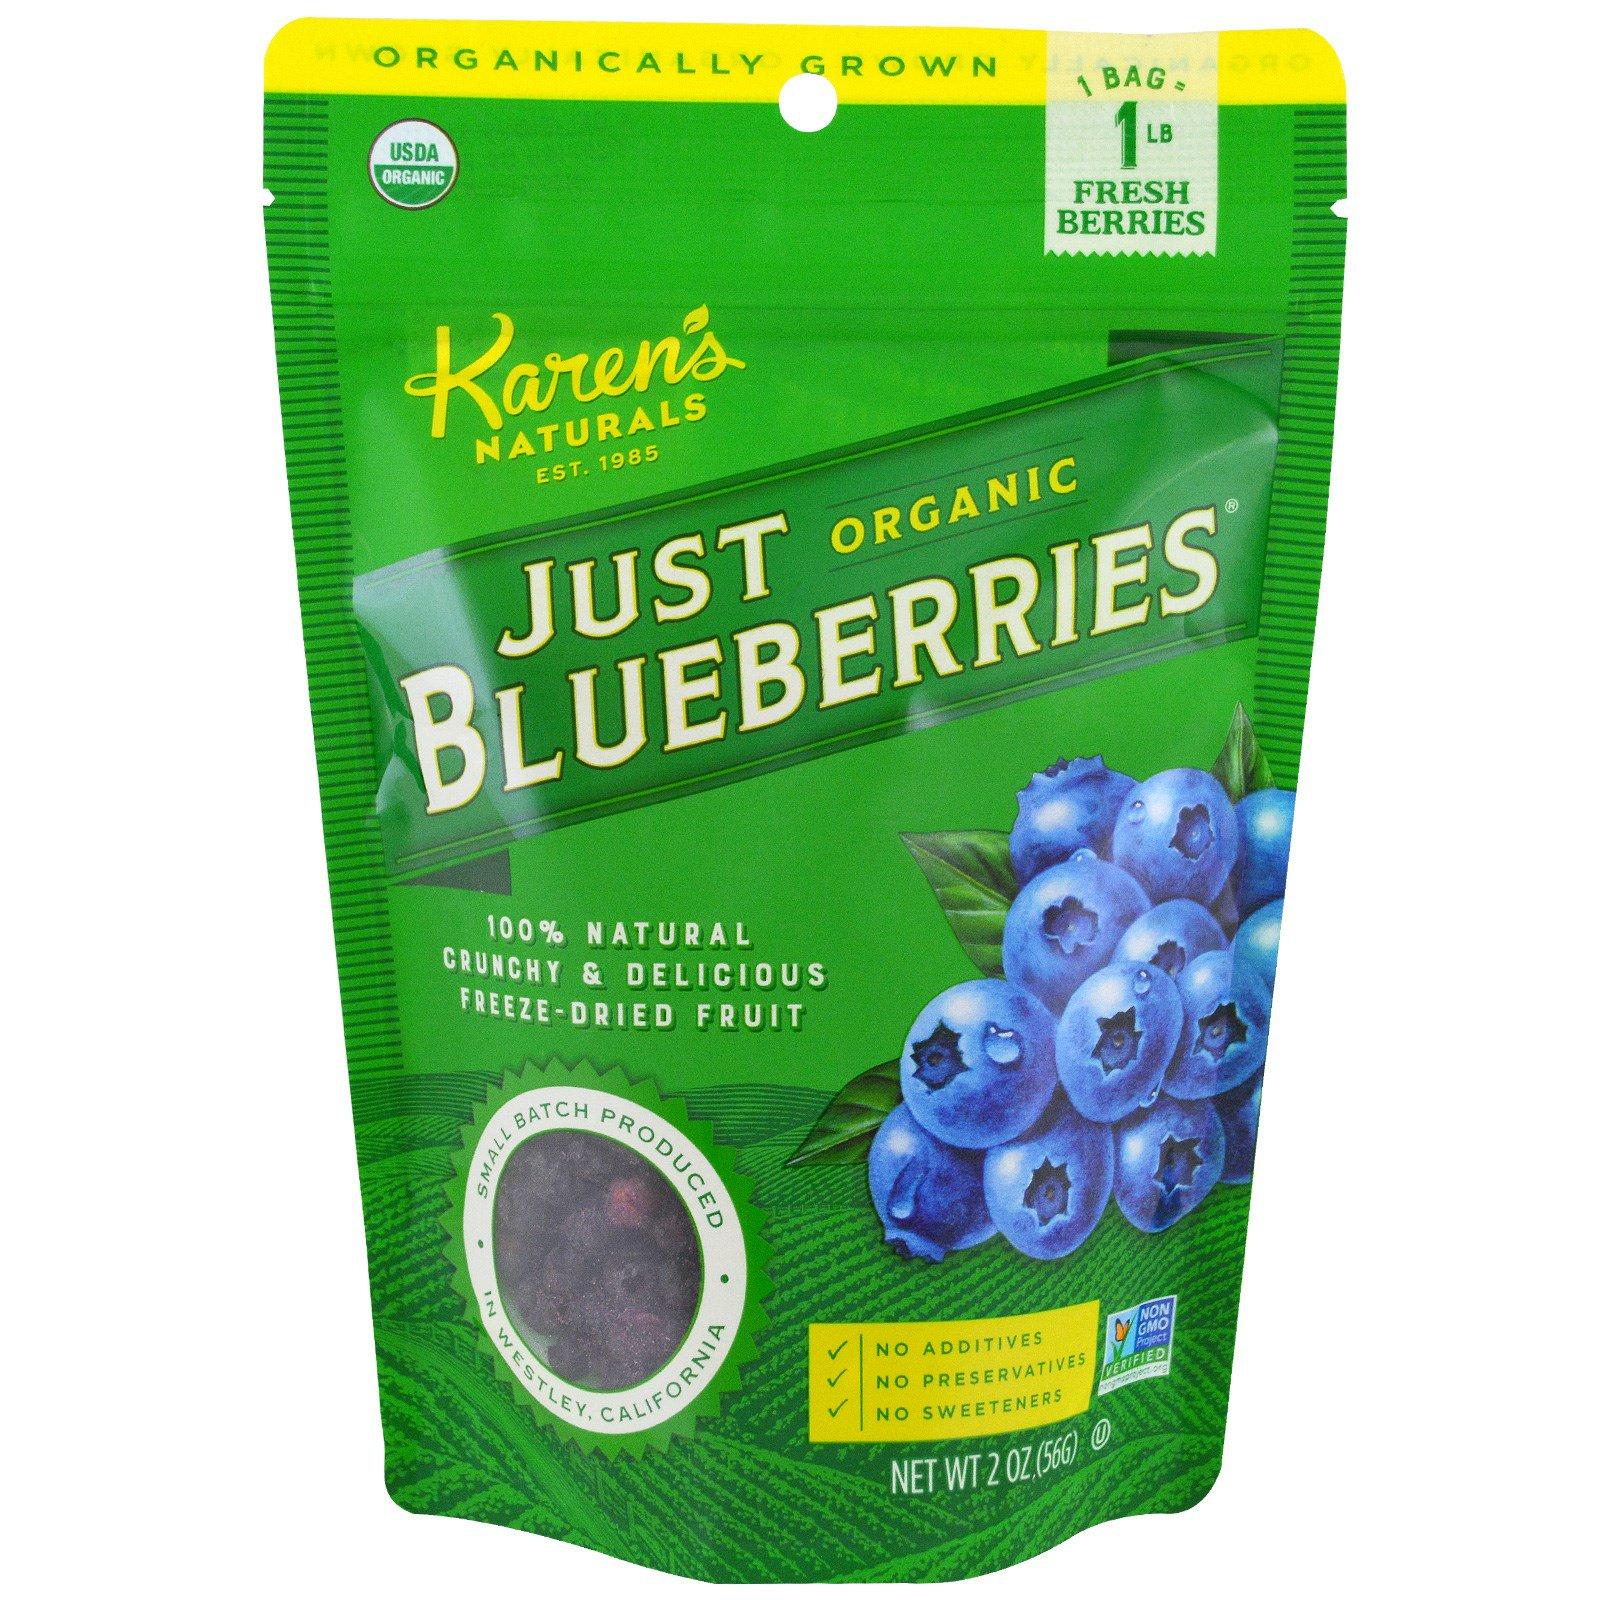 Karen's Naturals, Organic Just Blueberries, высушенные сублимацией фрукты, 2 унции (56 г)